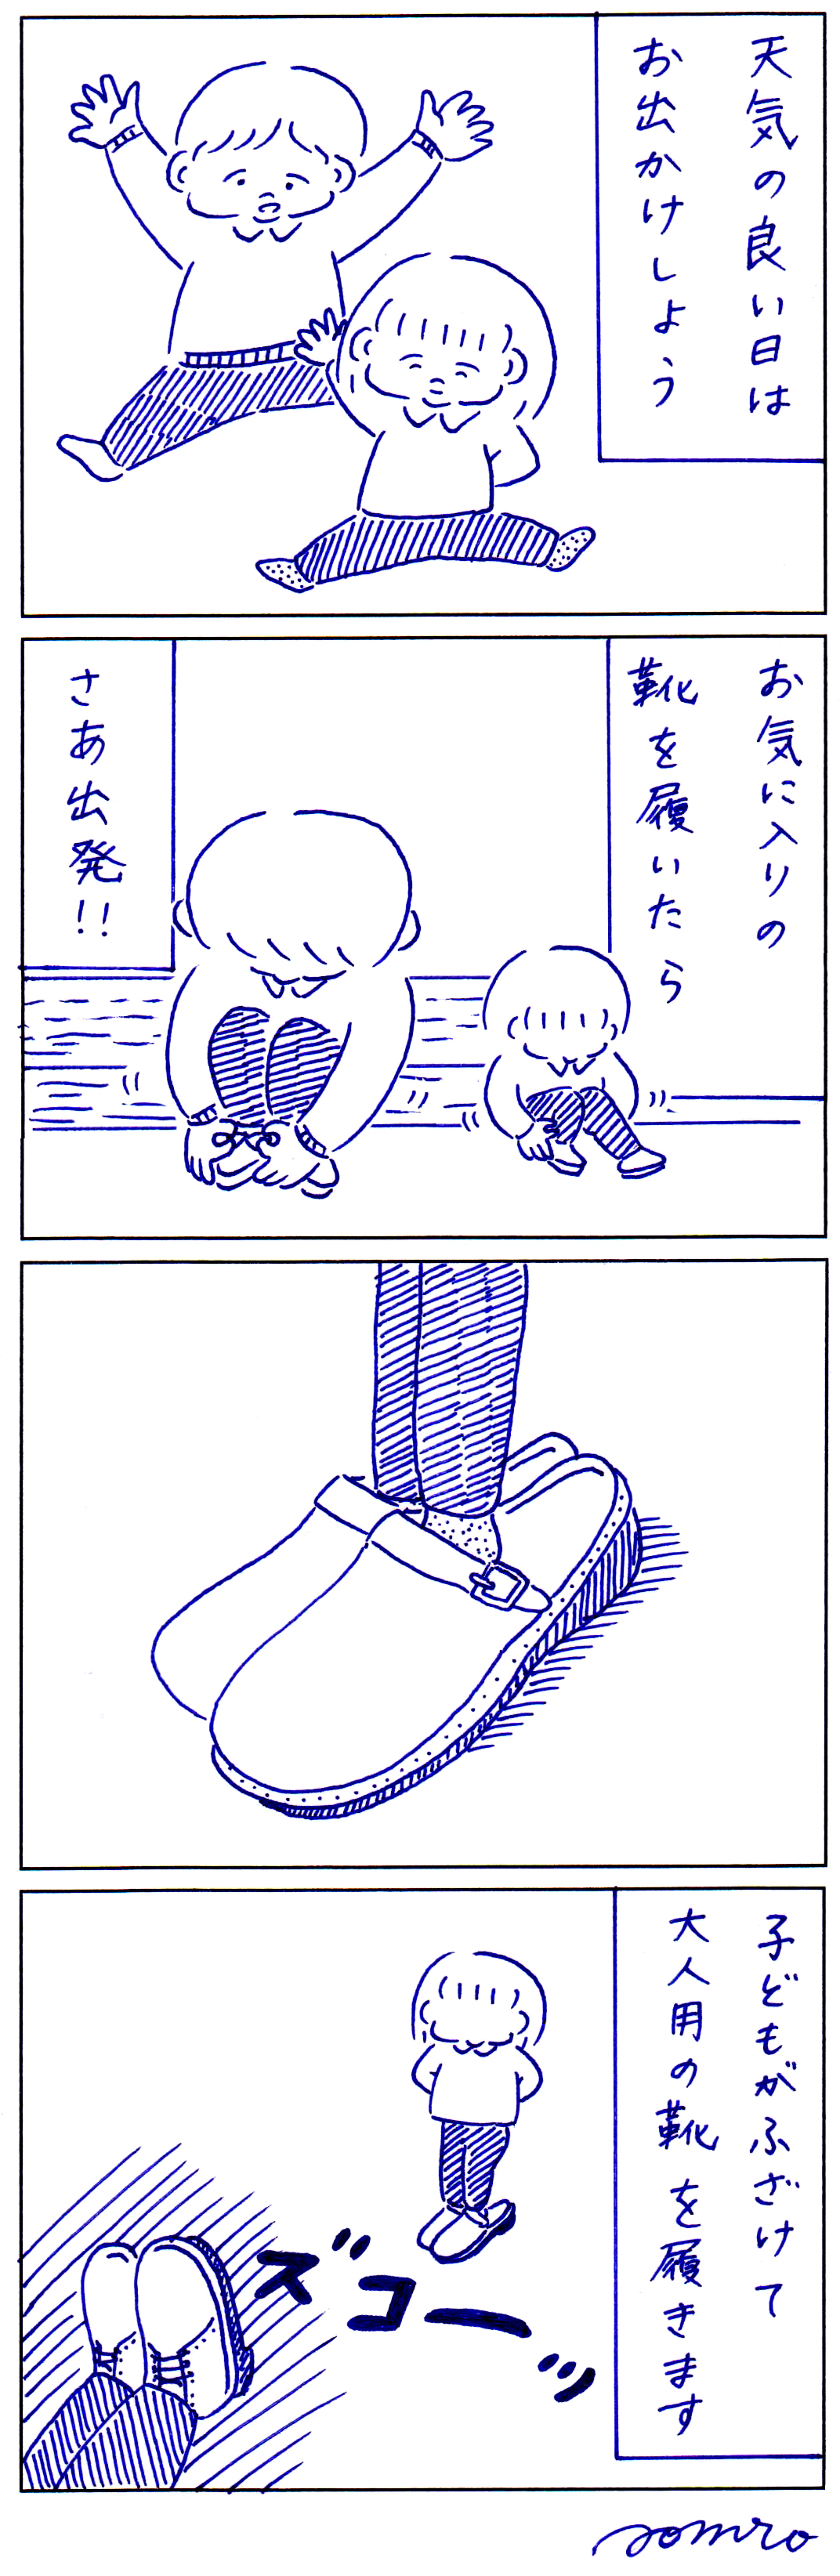 1701_01